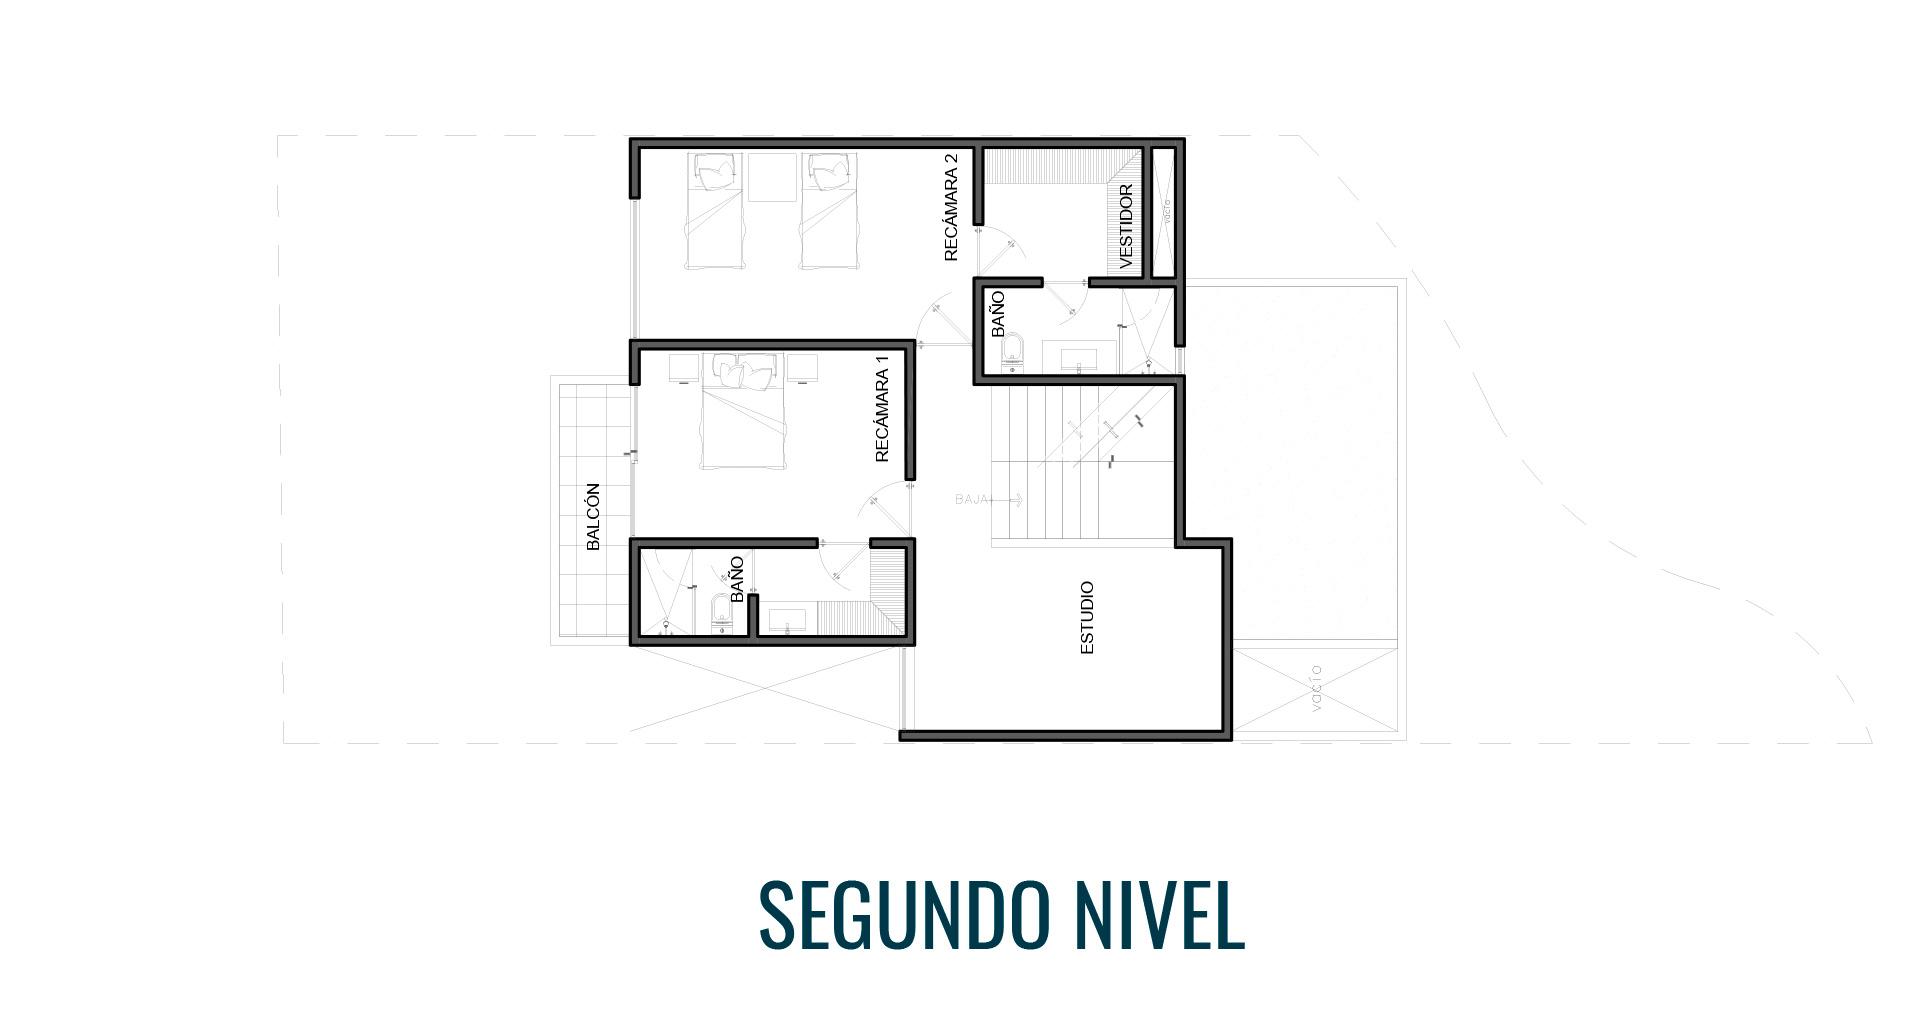 Margaritas 339 residencial Mexihom Residencia 2 segundo nivel